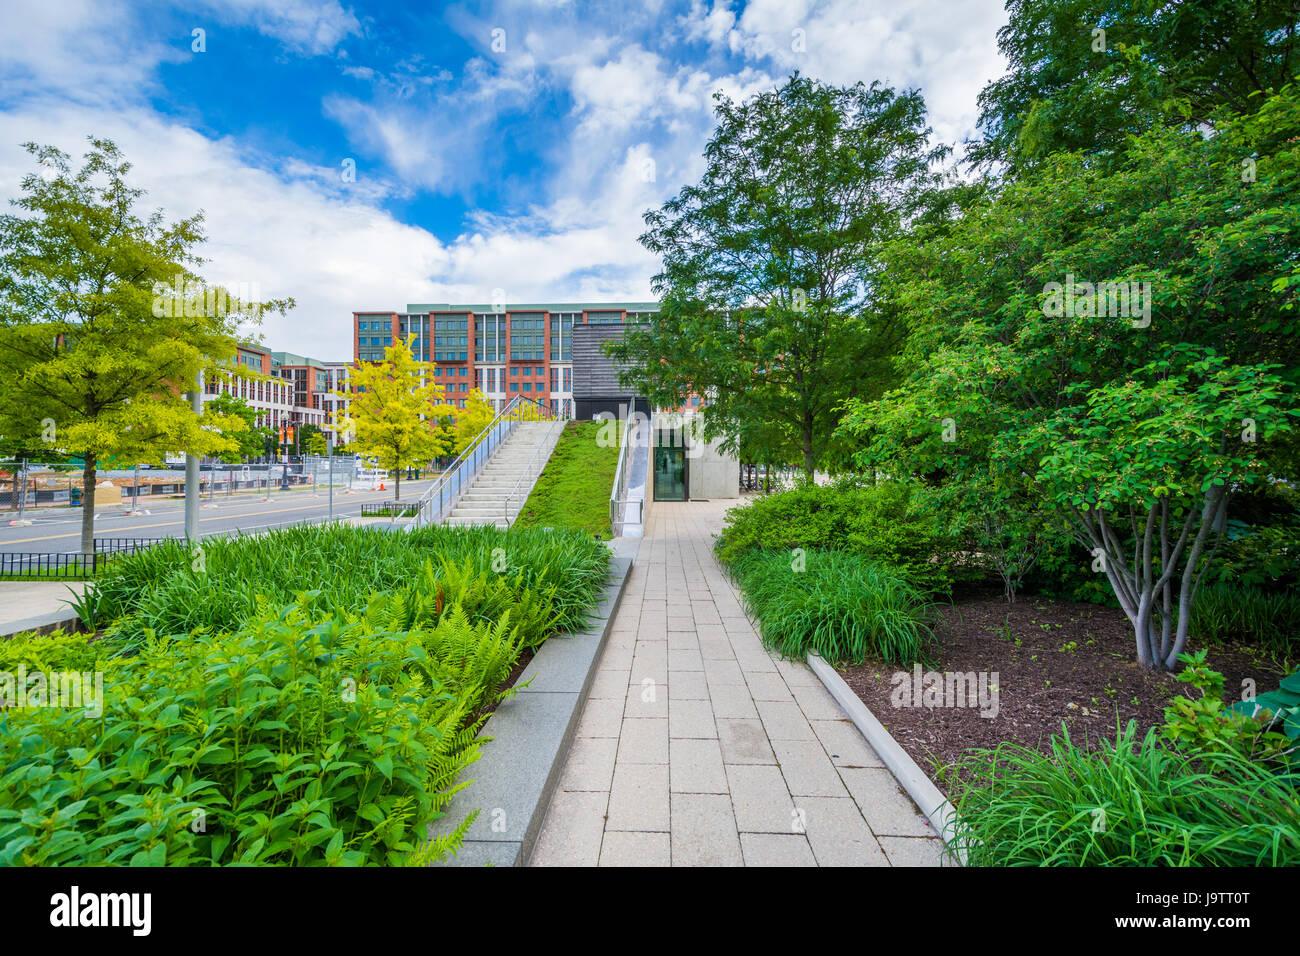 Gardens at Canal Park in the Navy Yard neighborhood of Washington, DC. Stock Photo